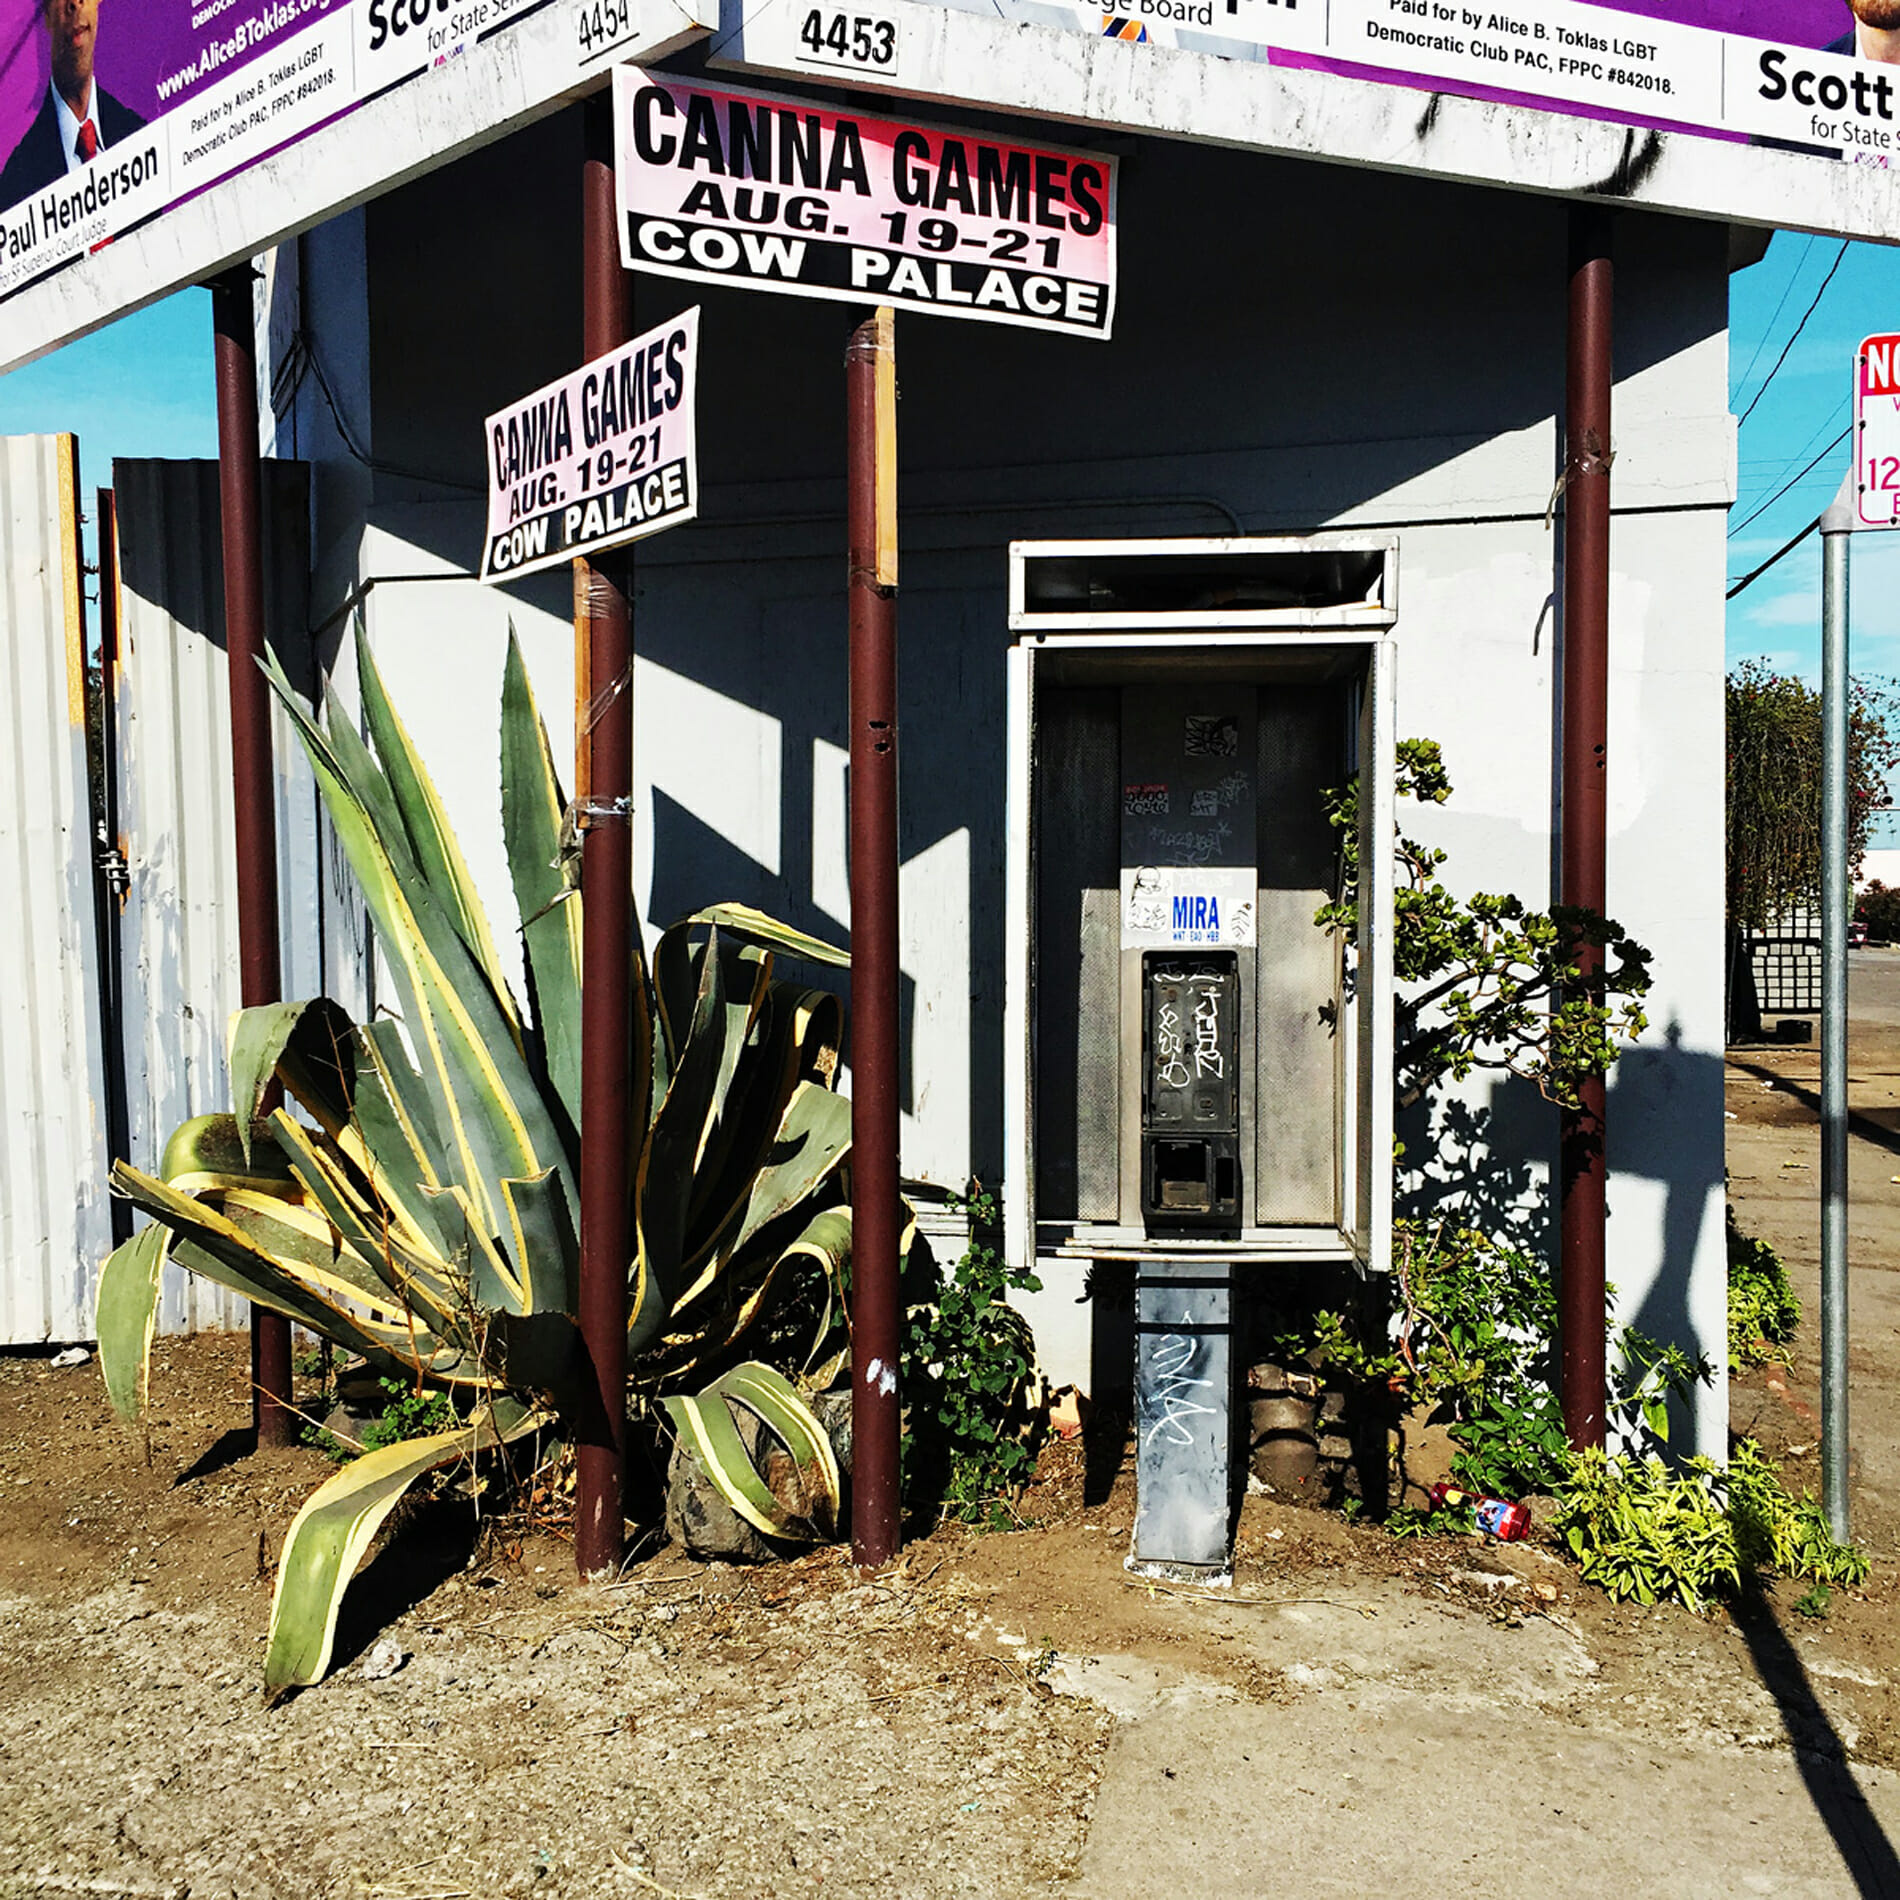 phone booth junk yard